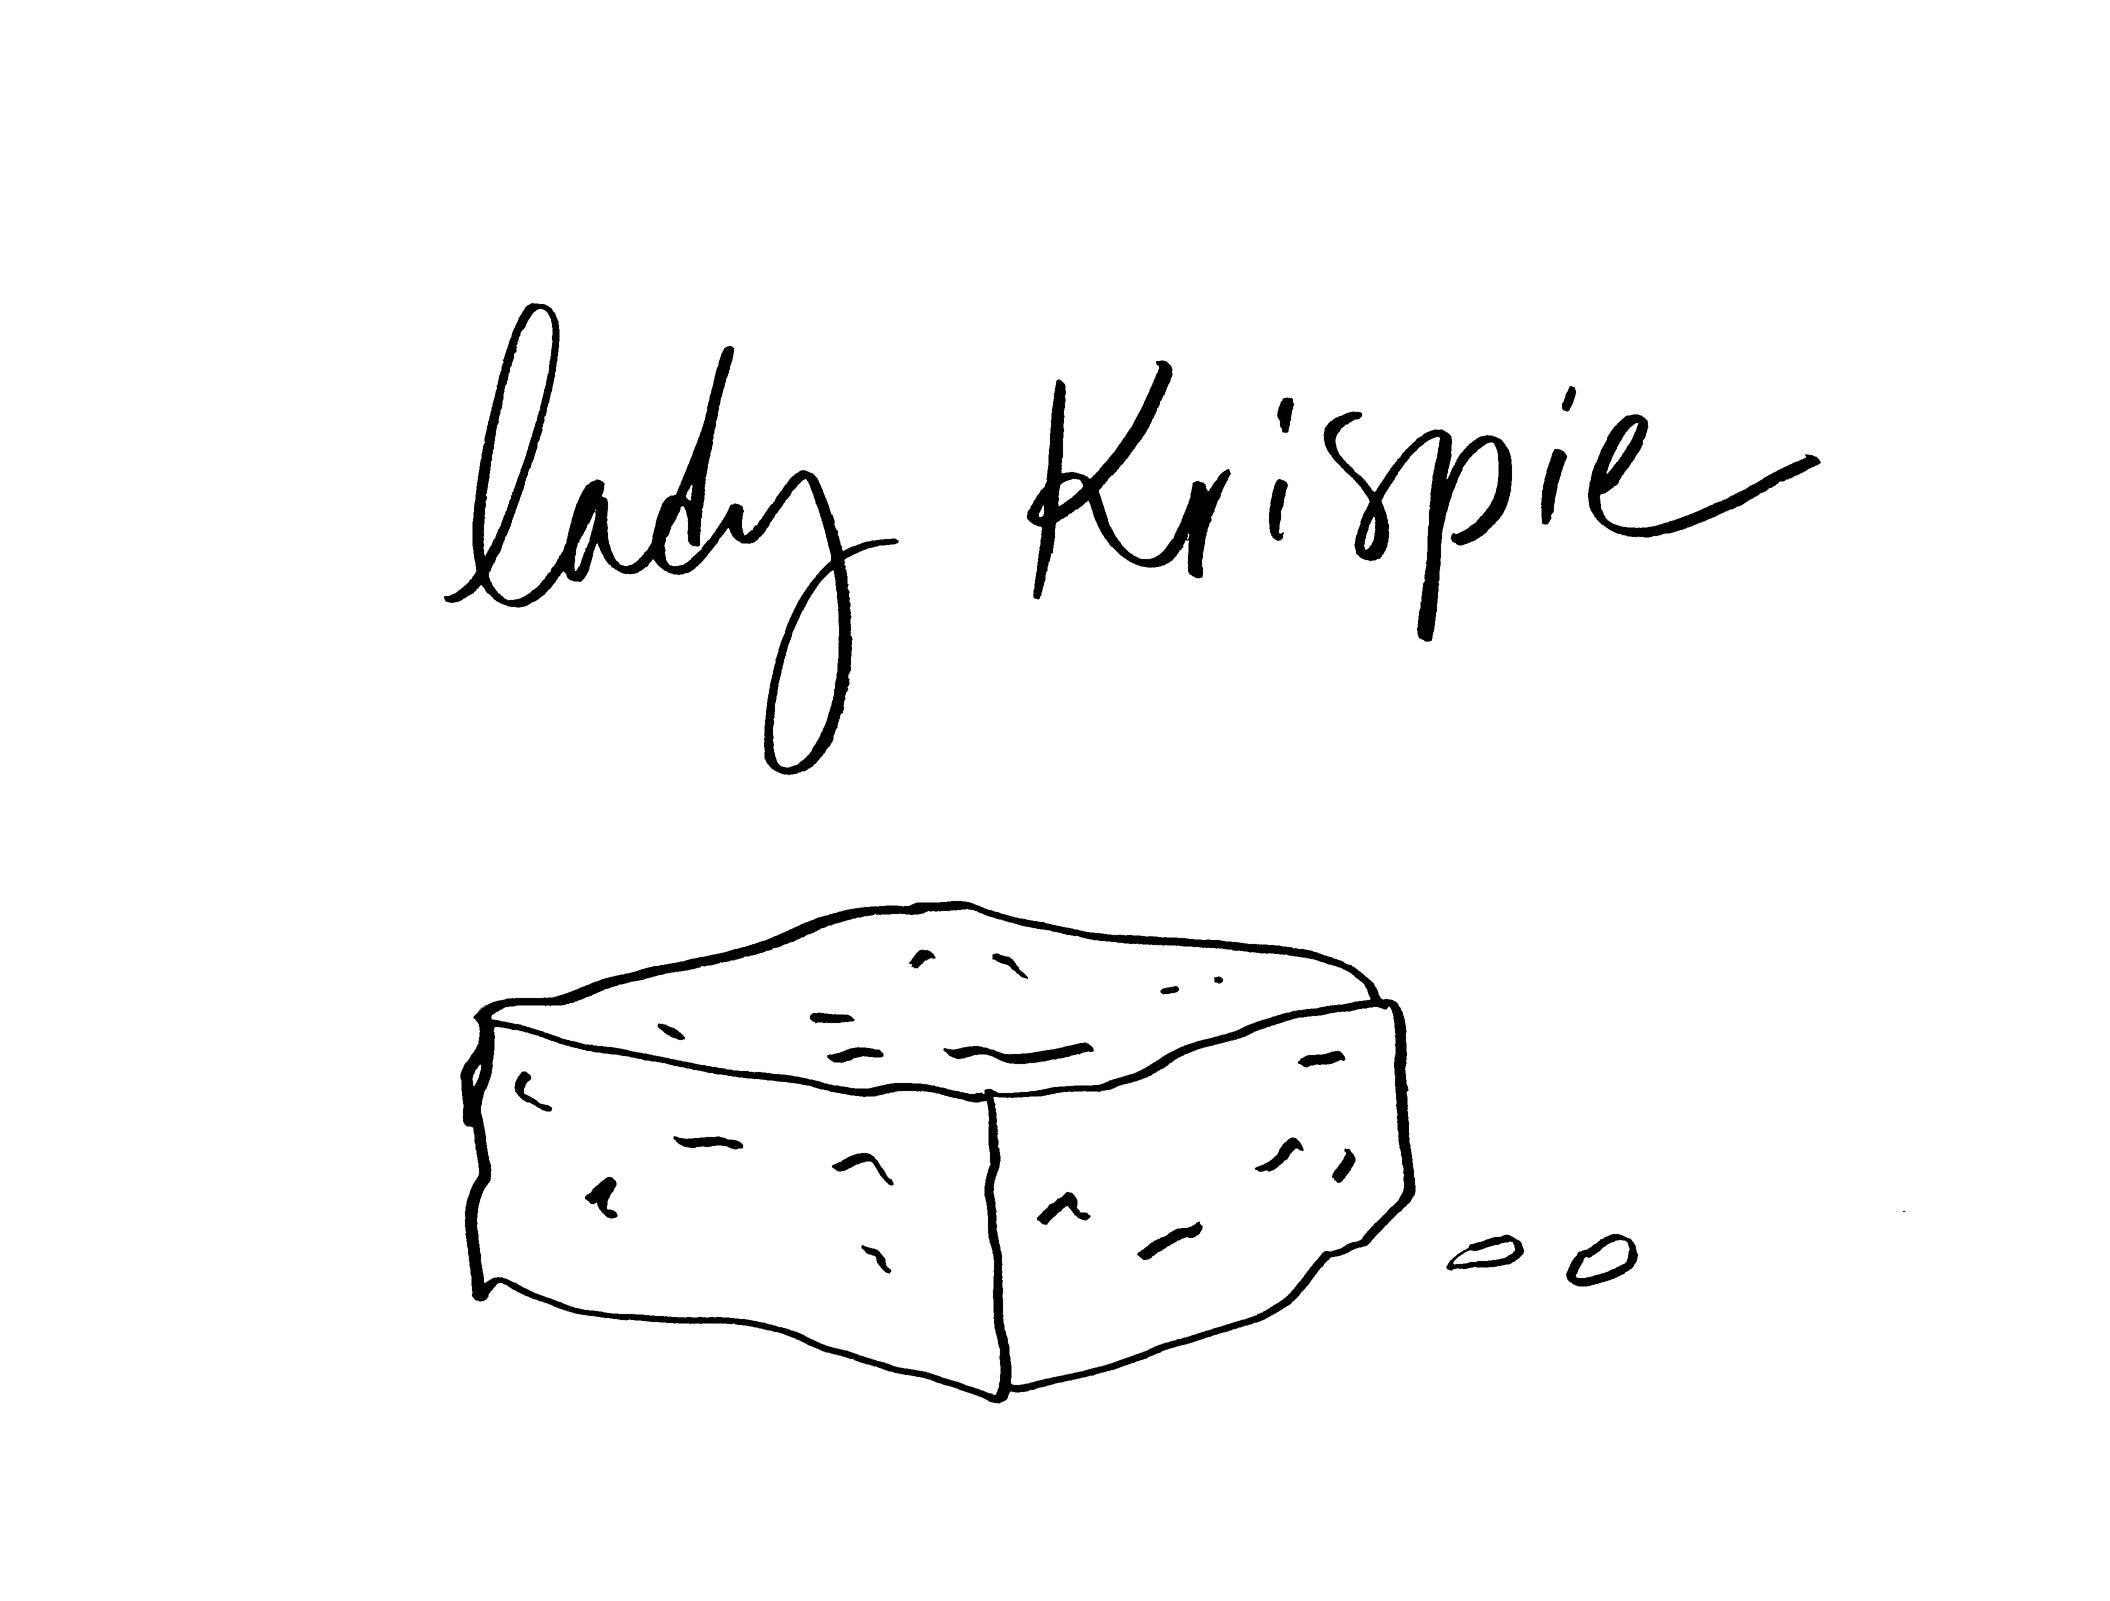 logo design for  Lady Krispie